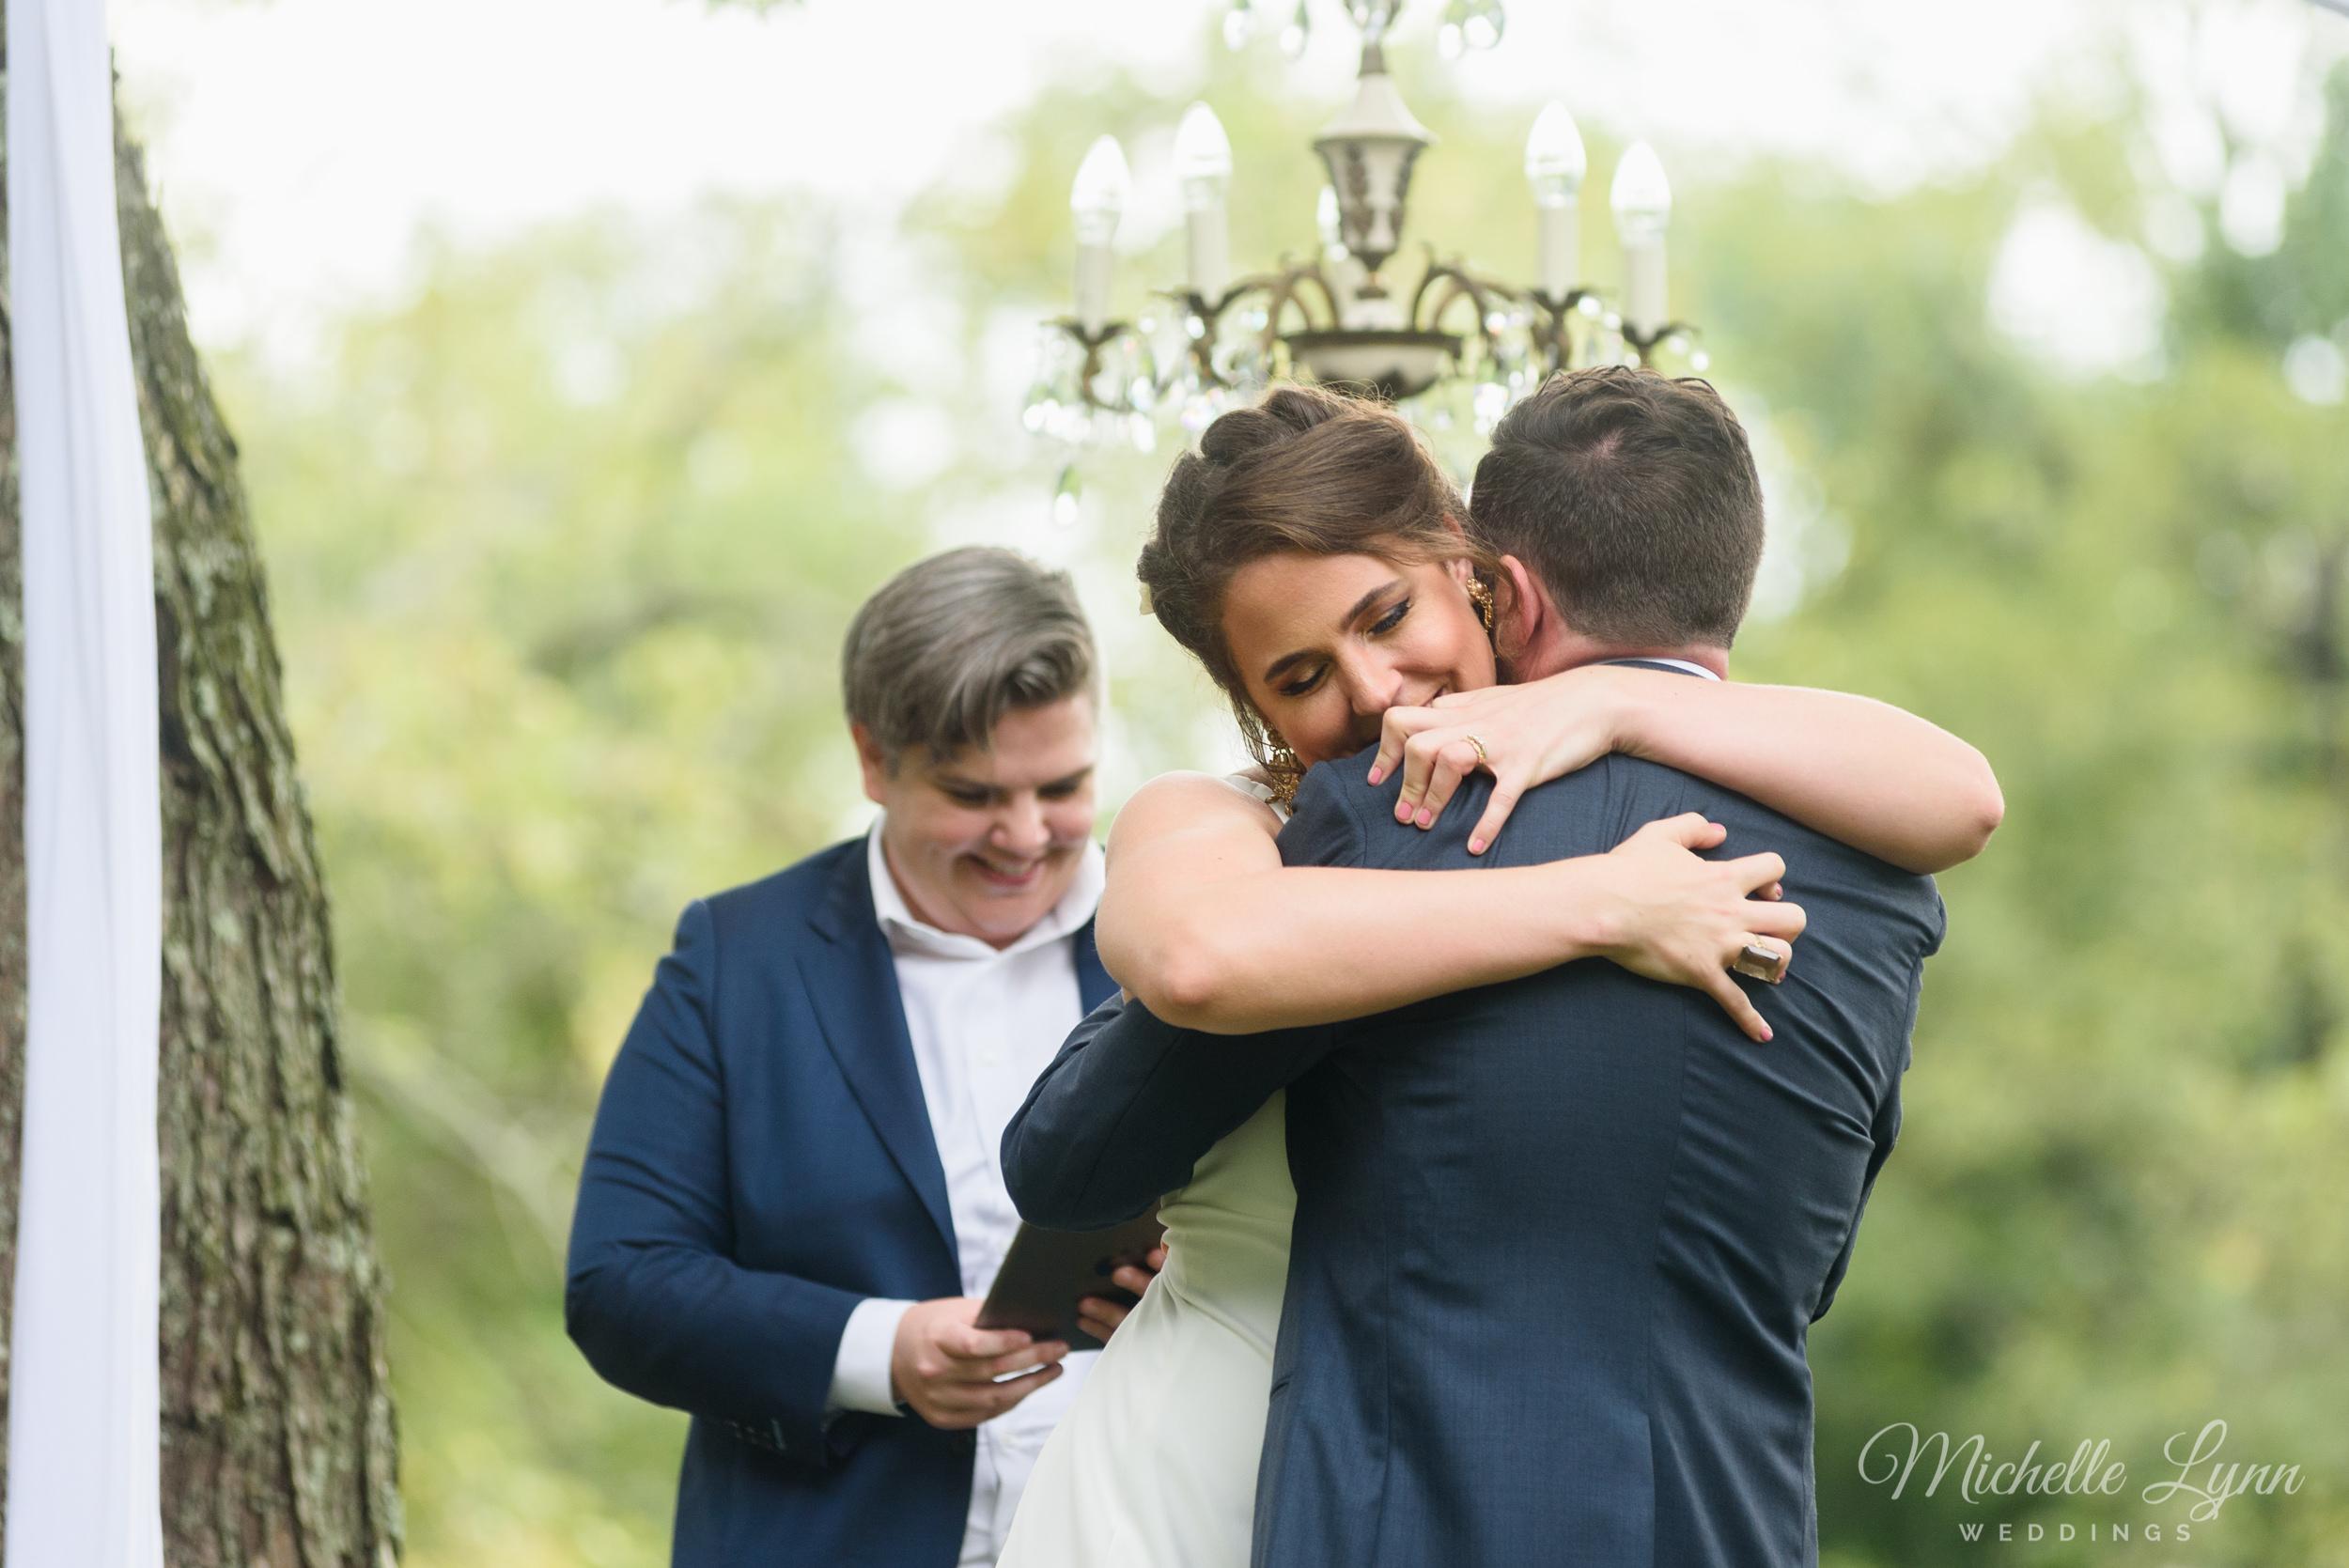 mlw-unionville-vineyards-nj-wedding-photography-46.jpg